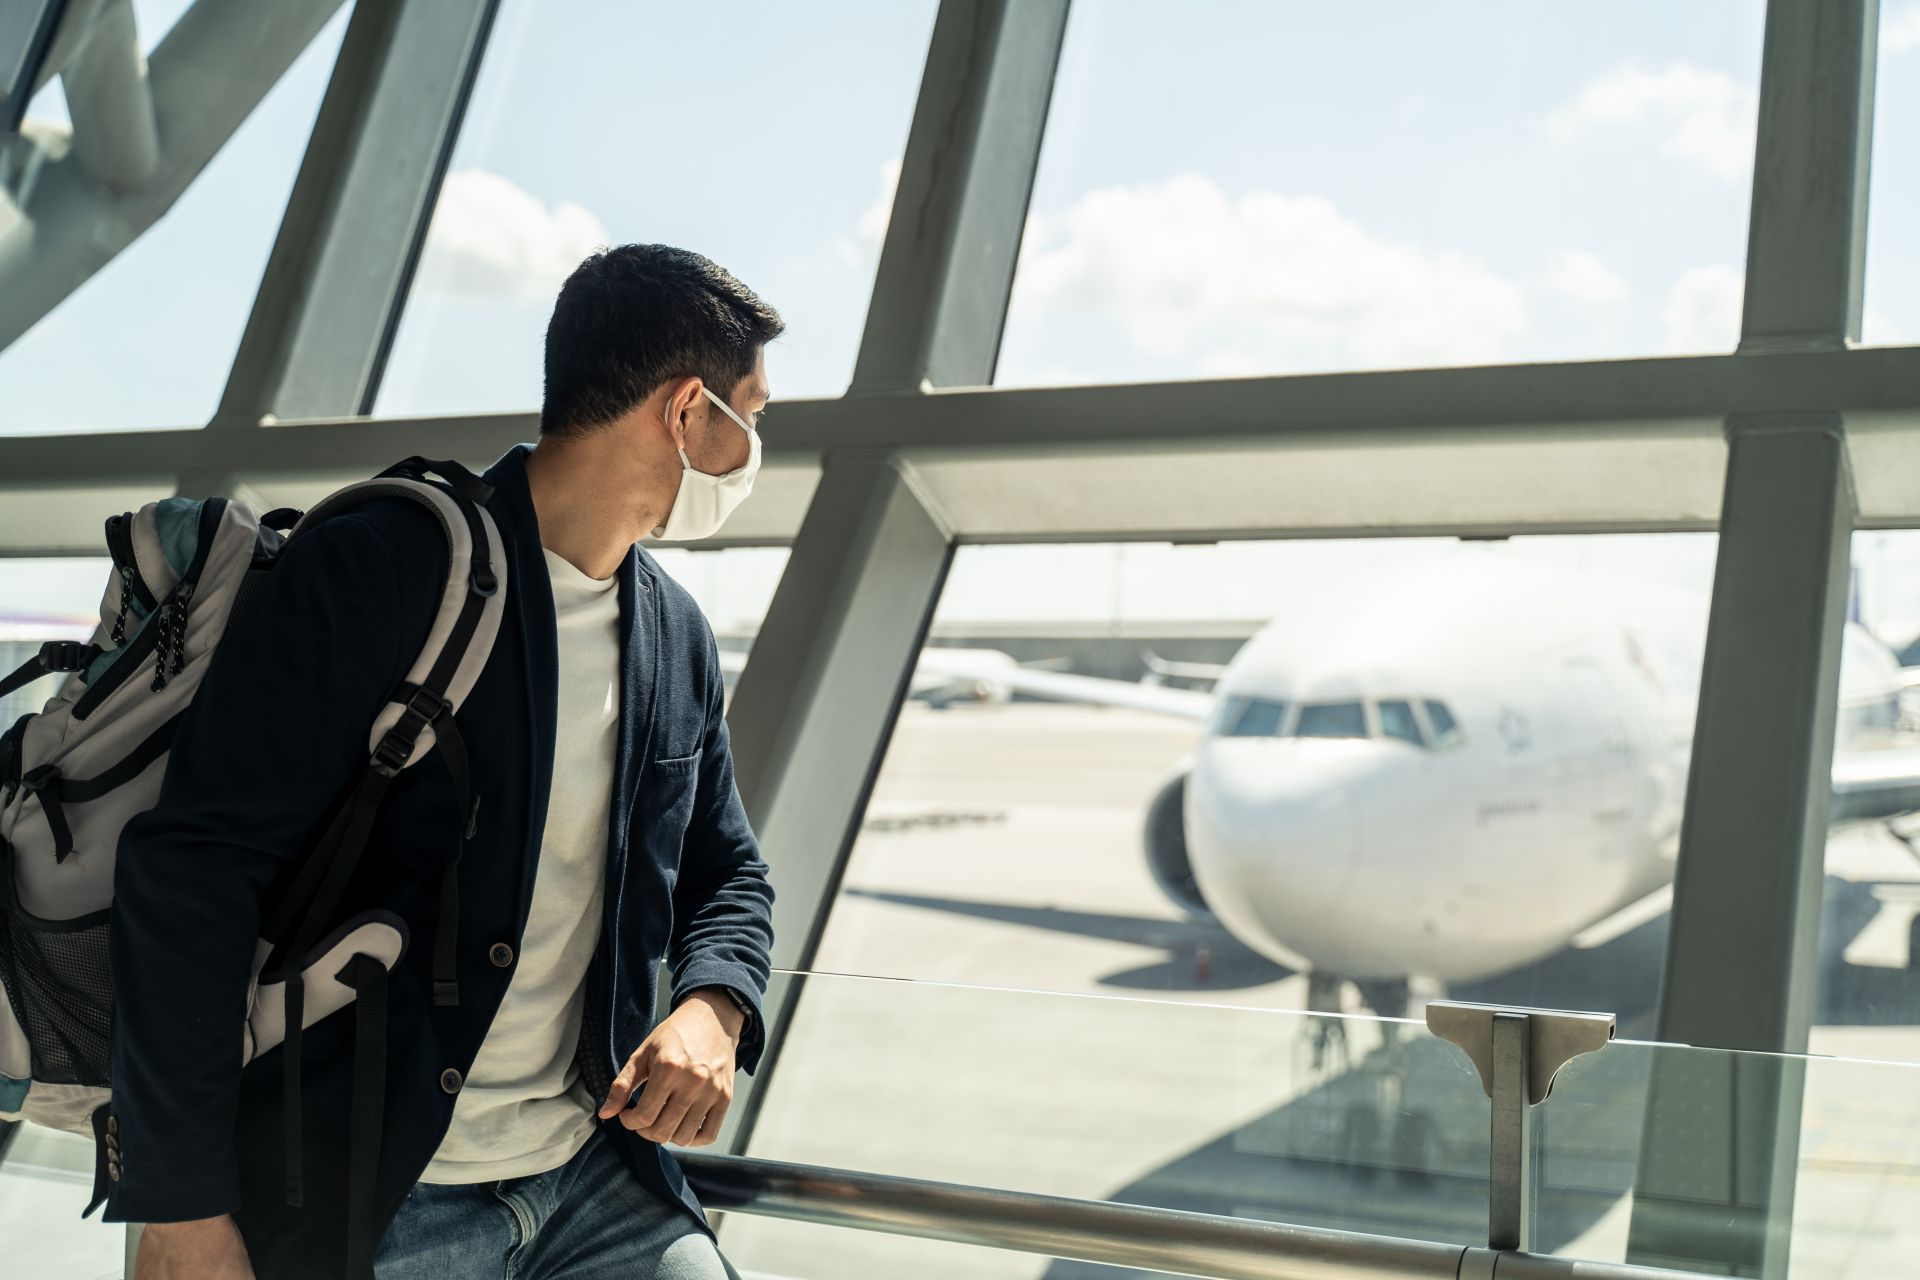 Syarat Terbaru Bepergian dengan Pesawat Terbang